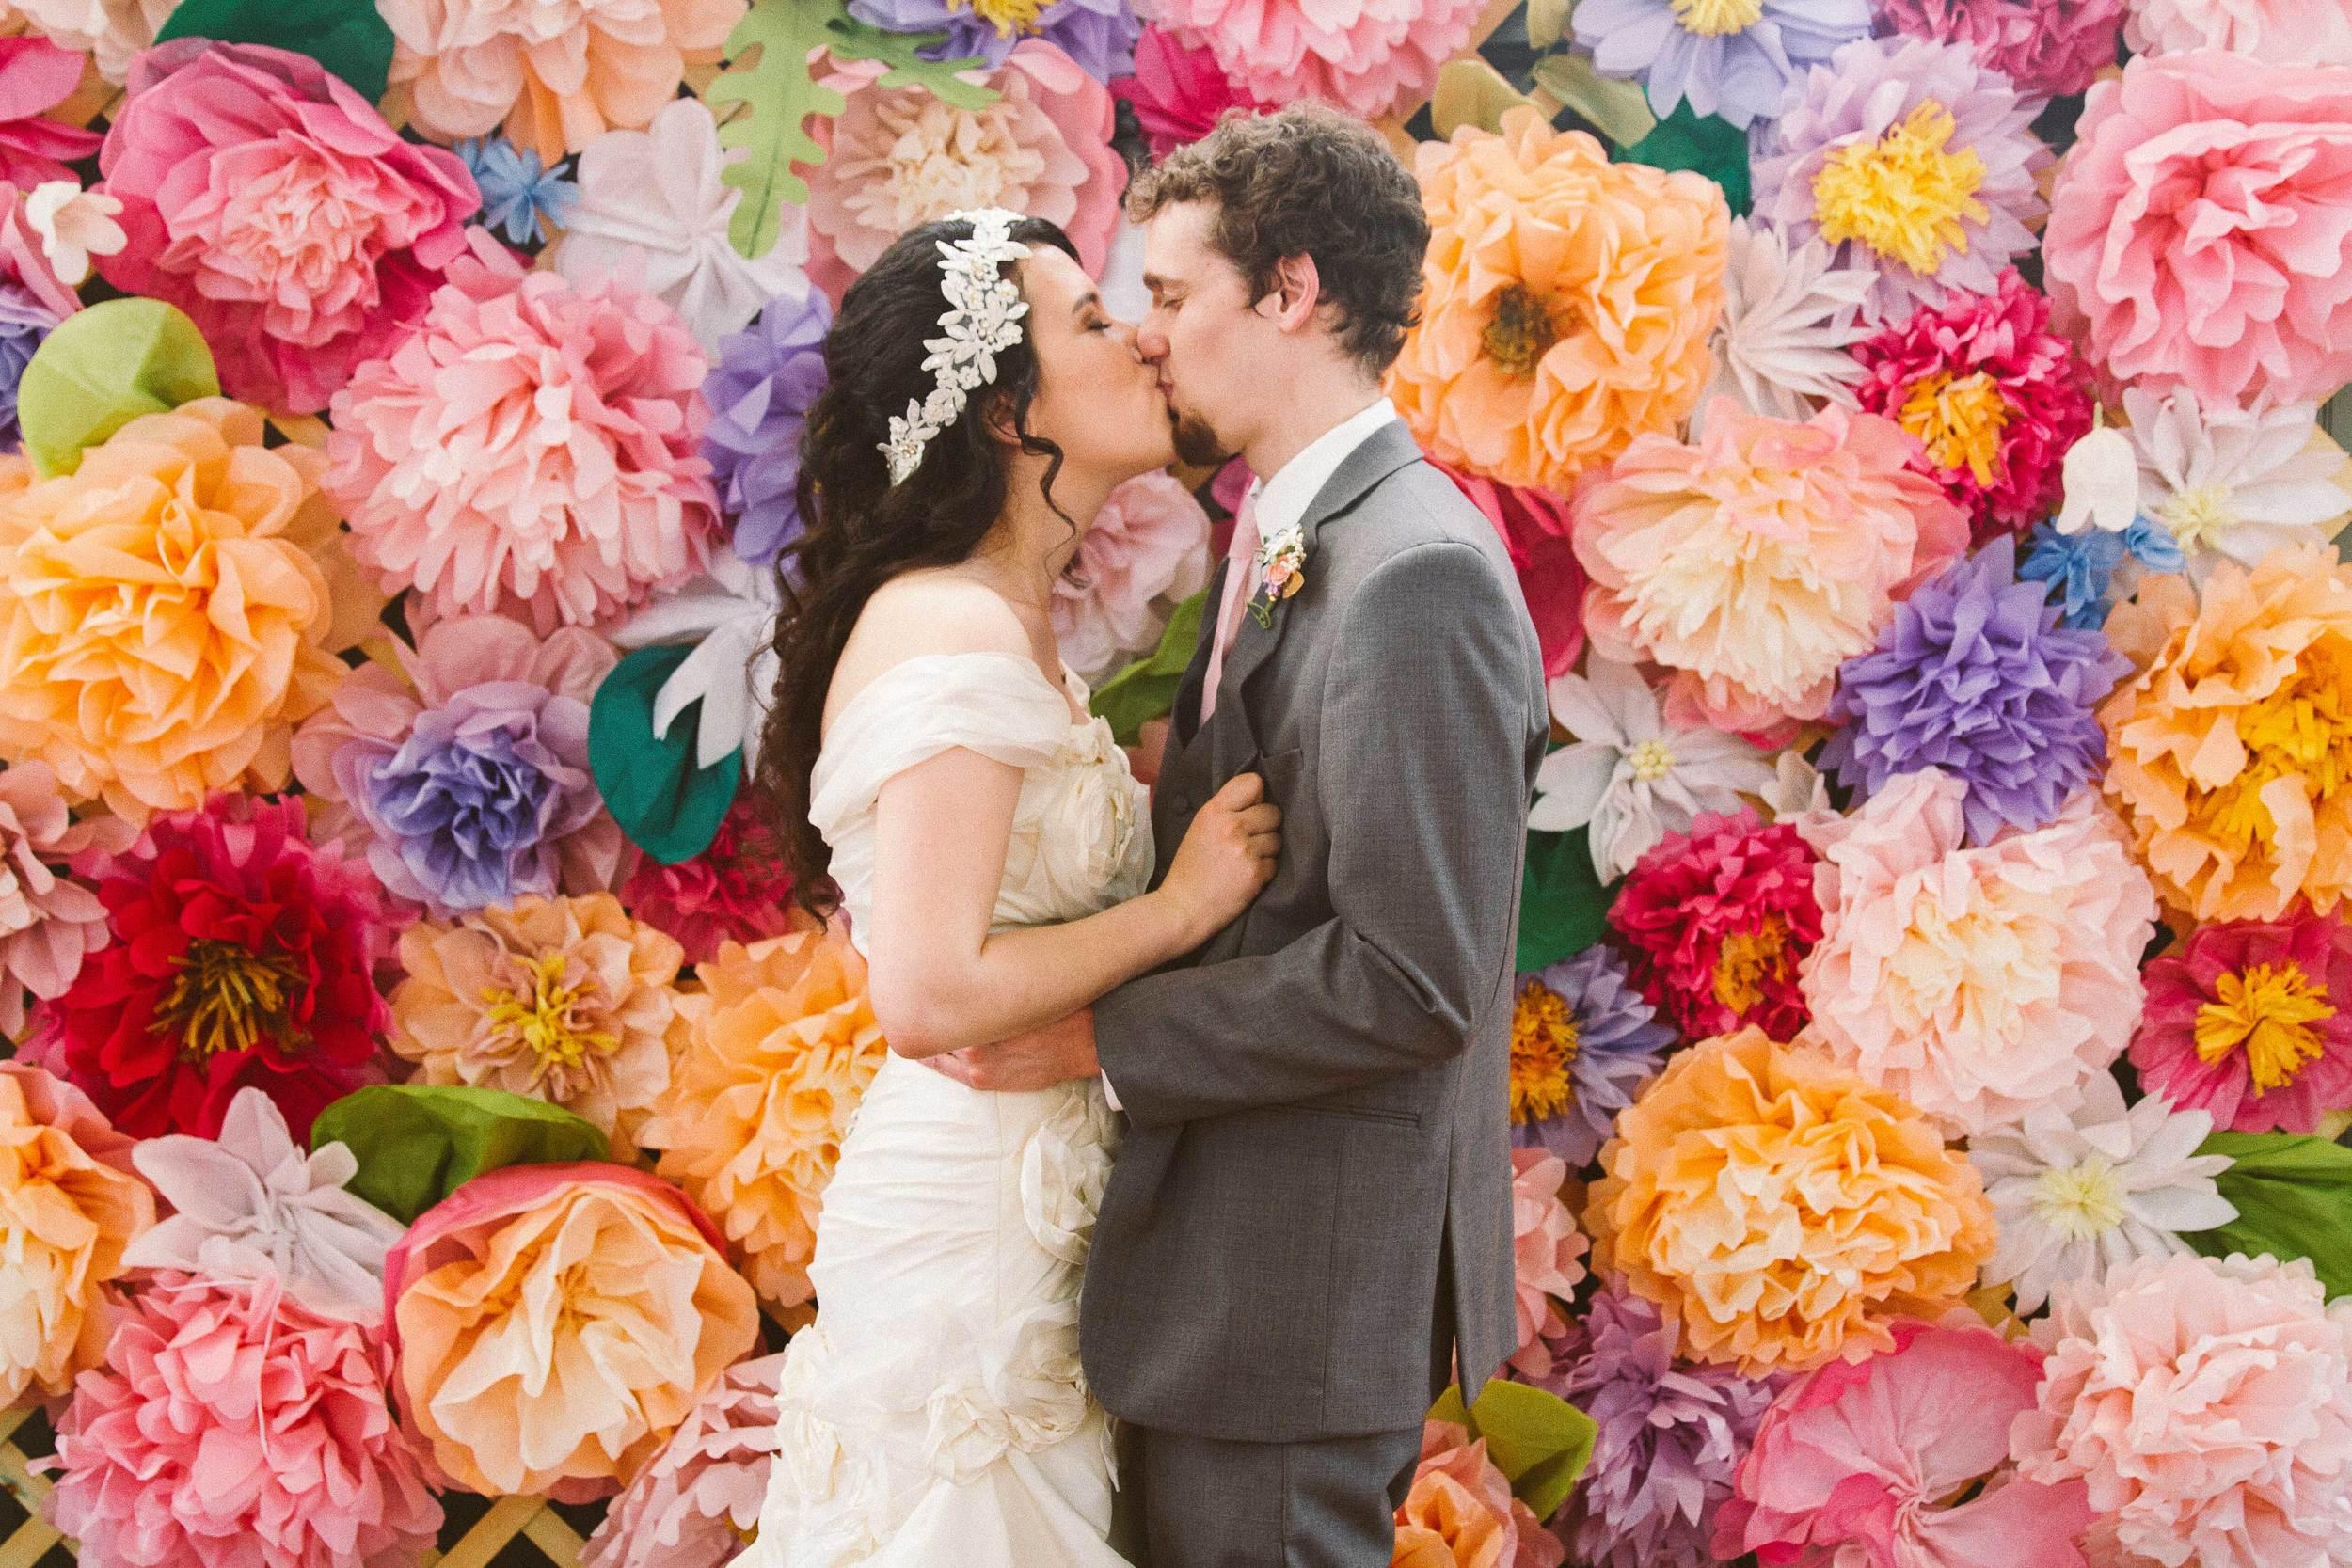 Radka-Wedding-Radka-April-18-2015-0456.jpg